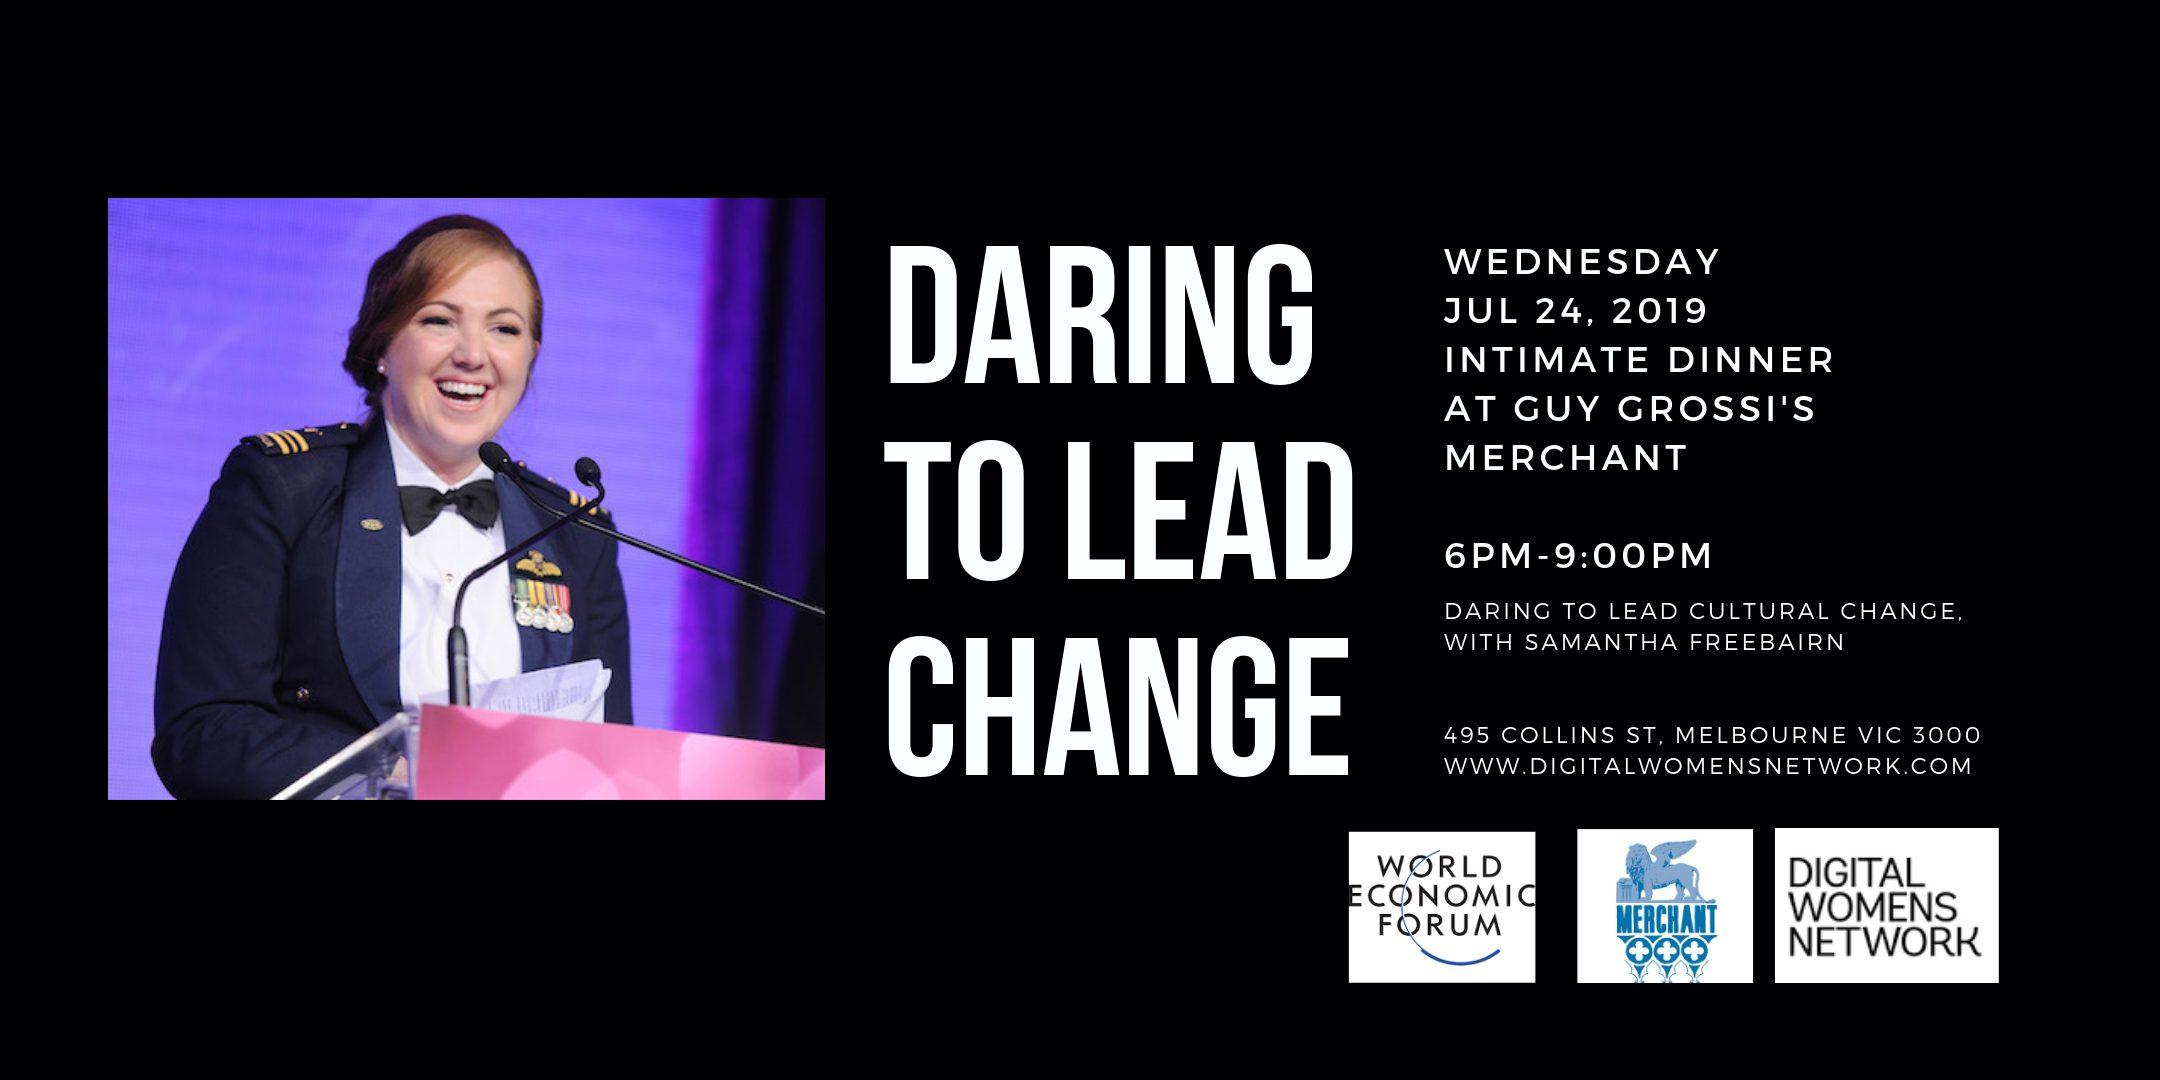 Dare to lead cultural change